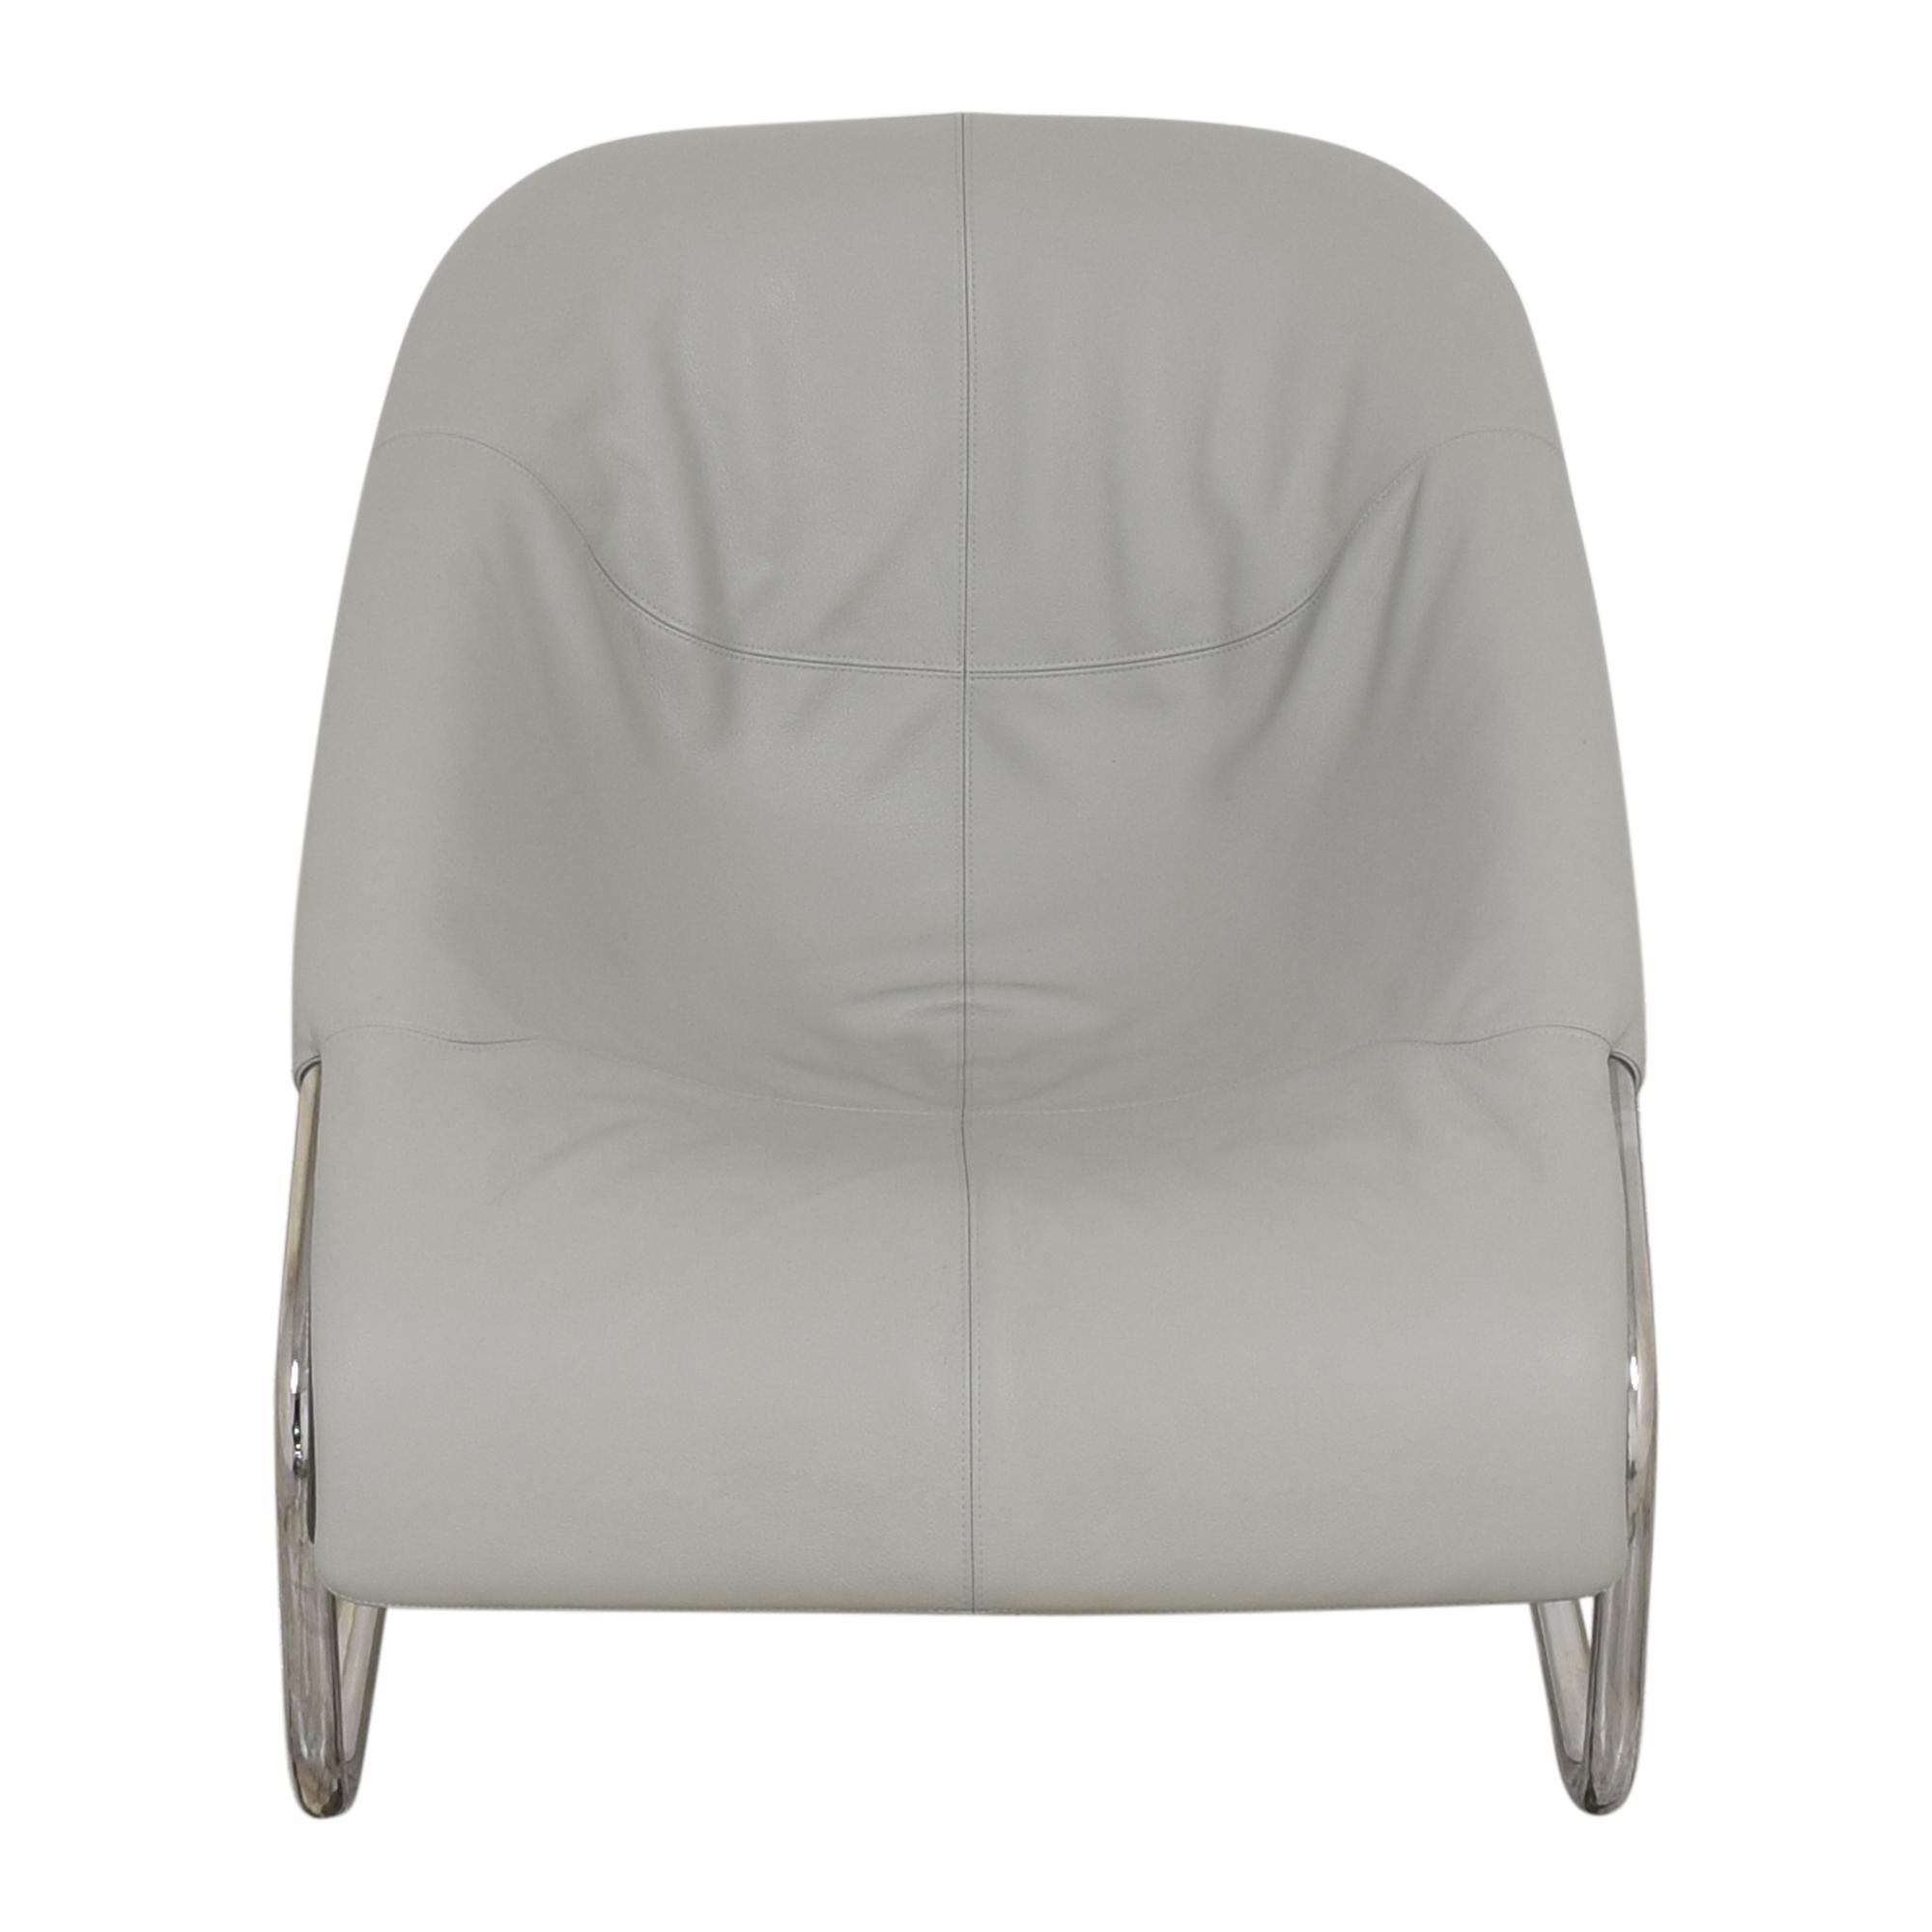 shop Minotti Cortina Armchair Minotti Chairs